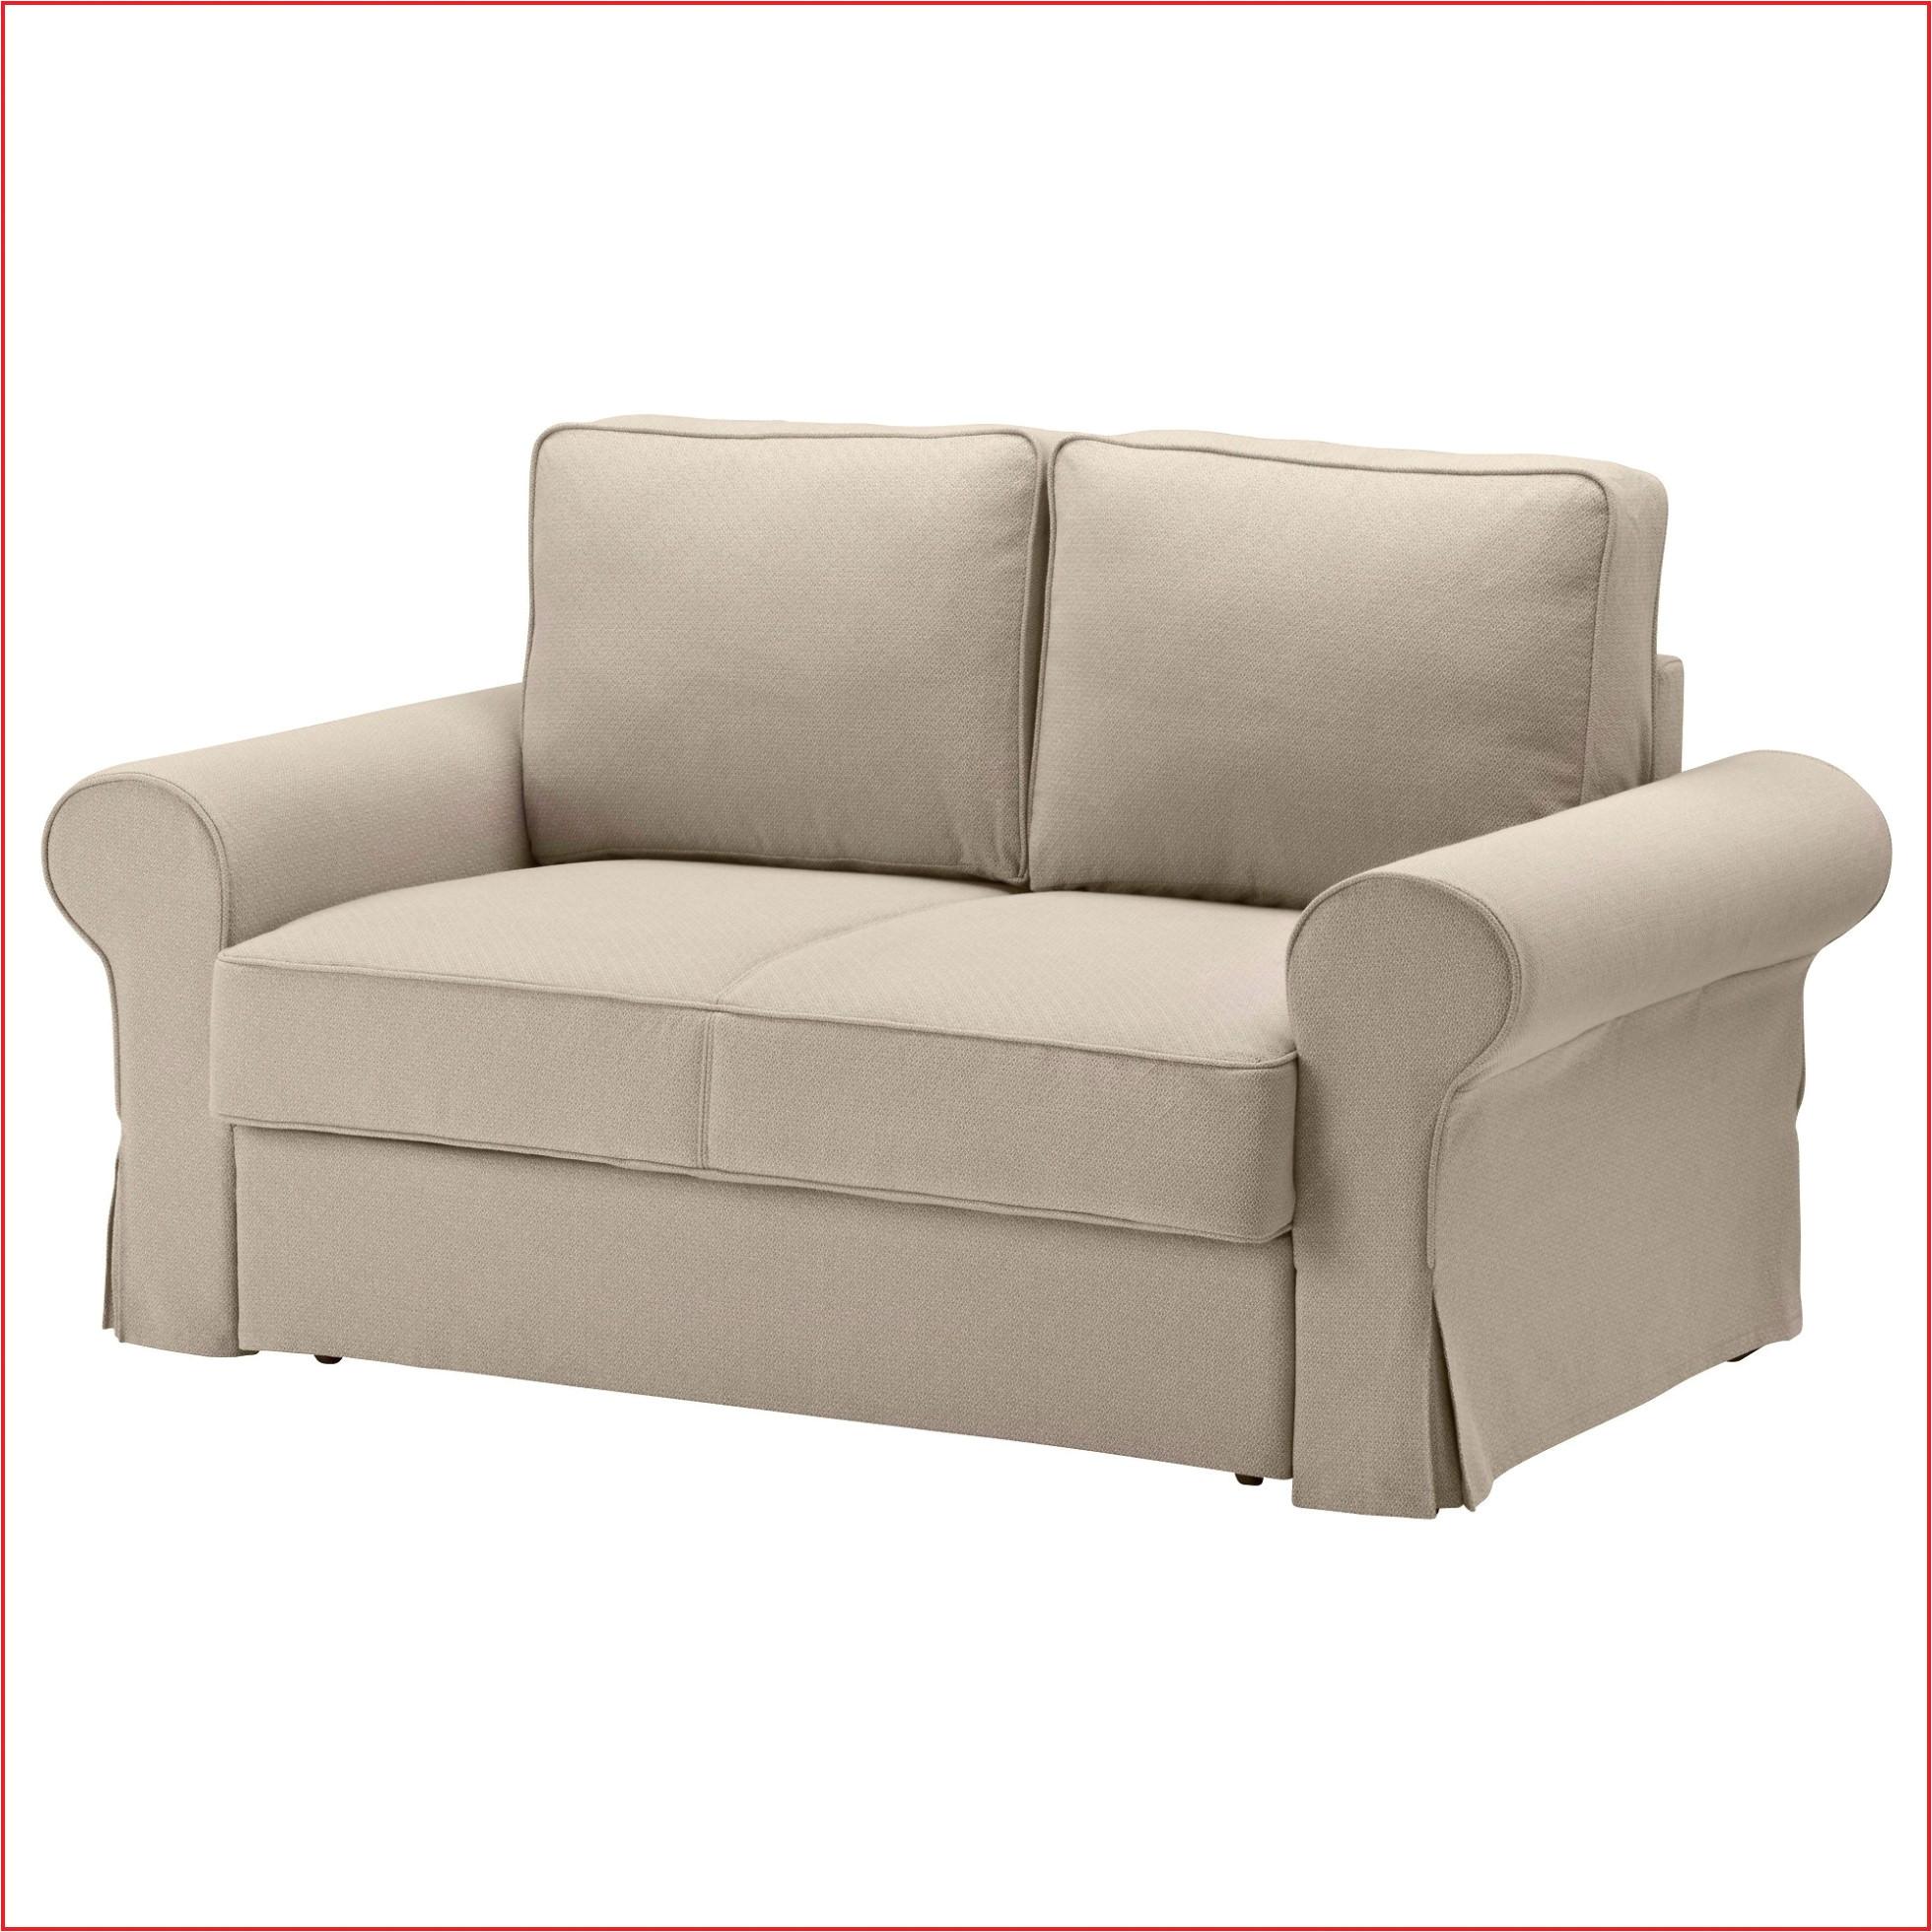 sofa cama en carrefour 531752 ventas de sofa cama baratos sofas